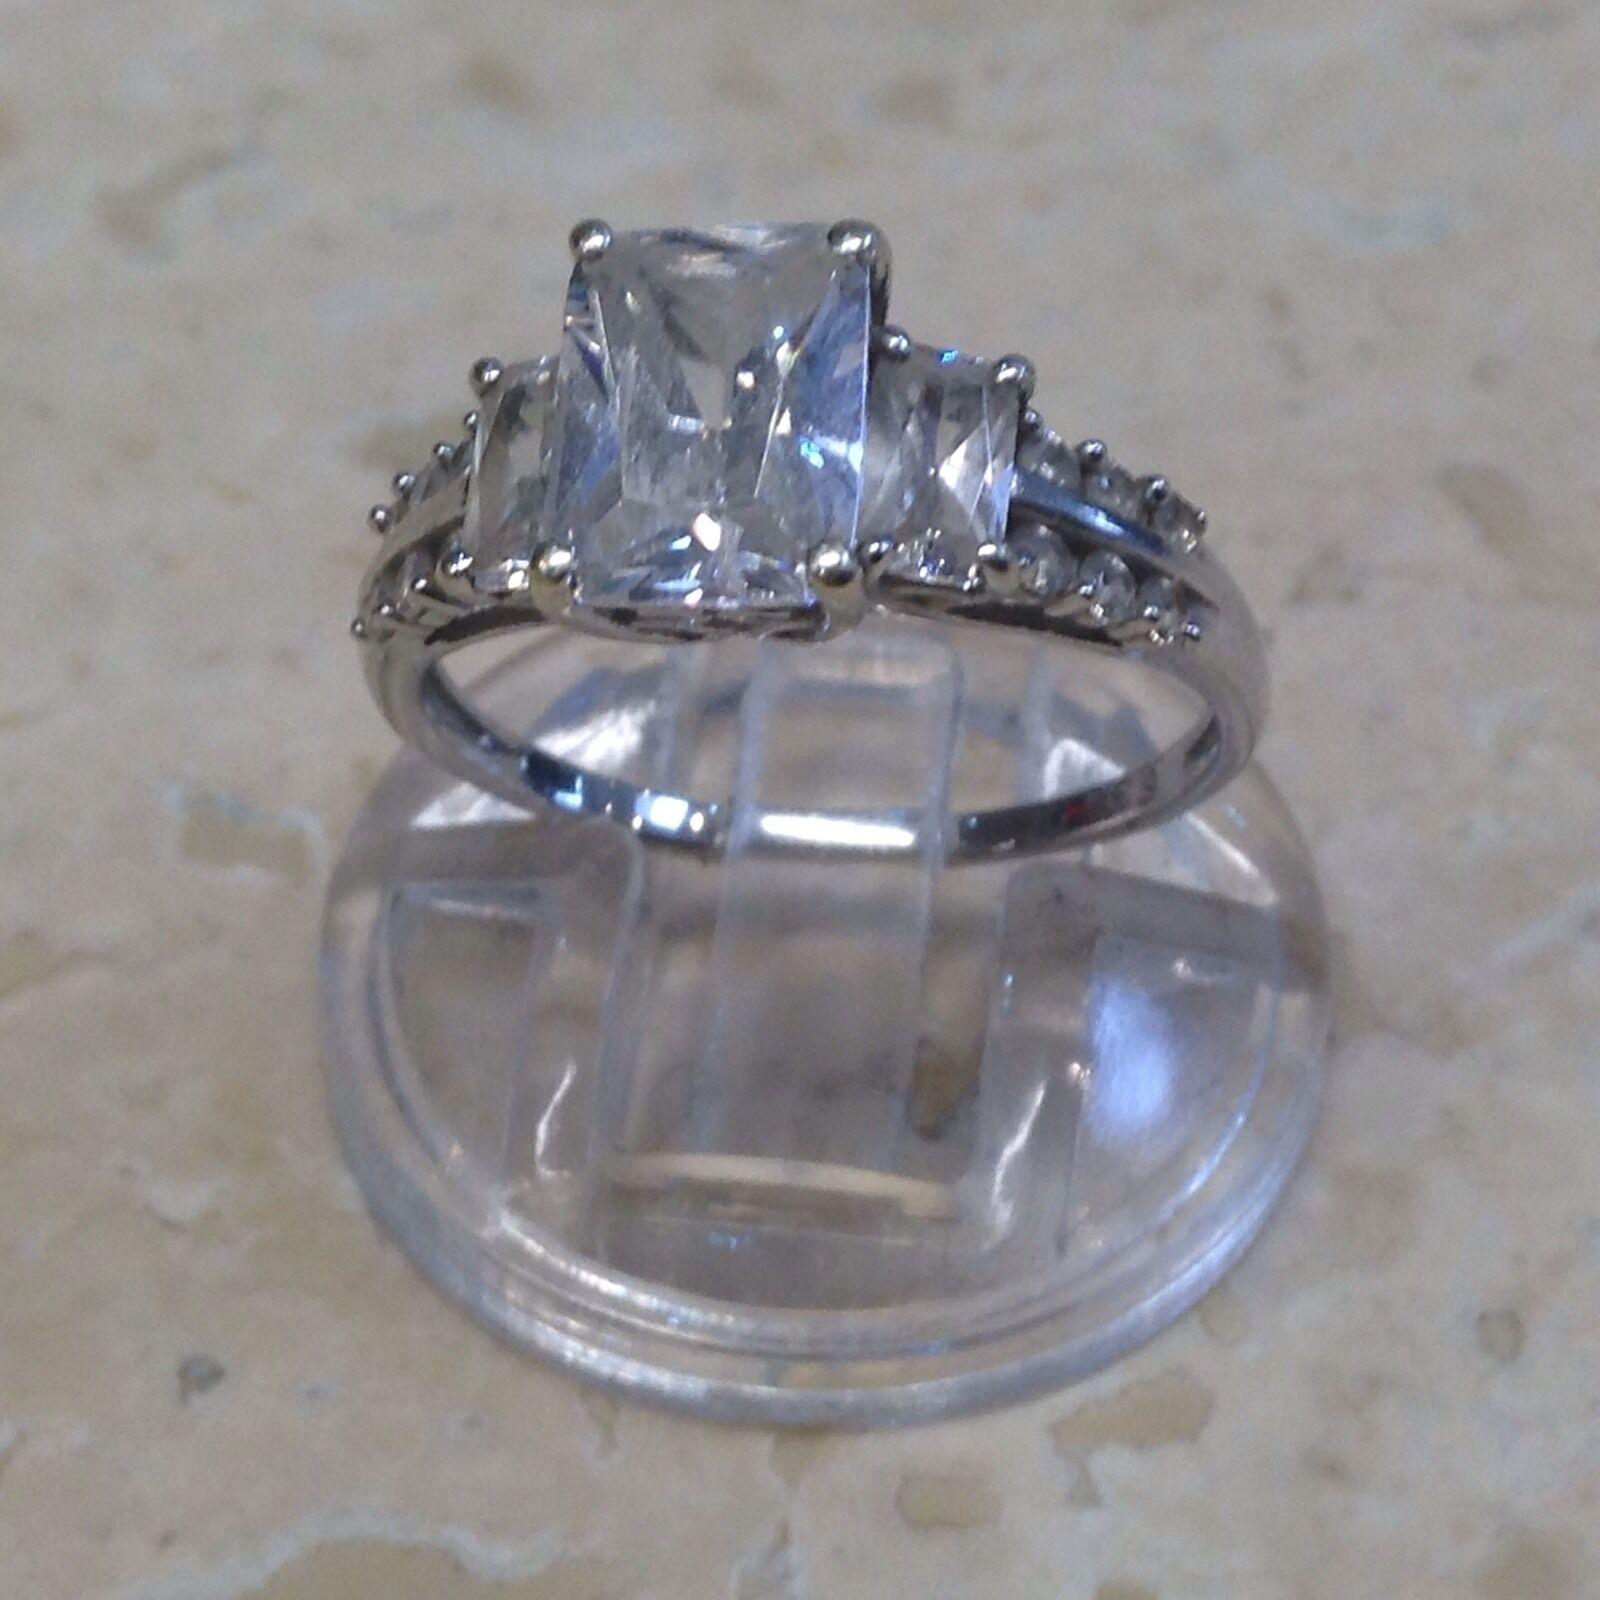 Stunning 9ct Cubic Zirconia Princess Cut Engagement Ring. Size N.